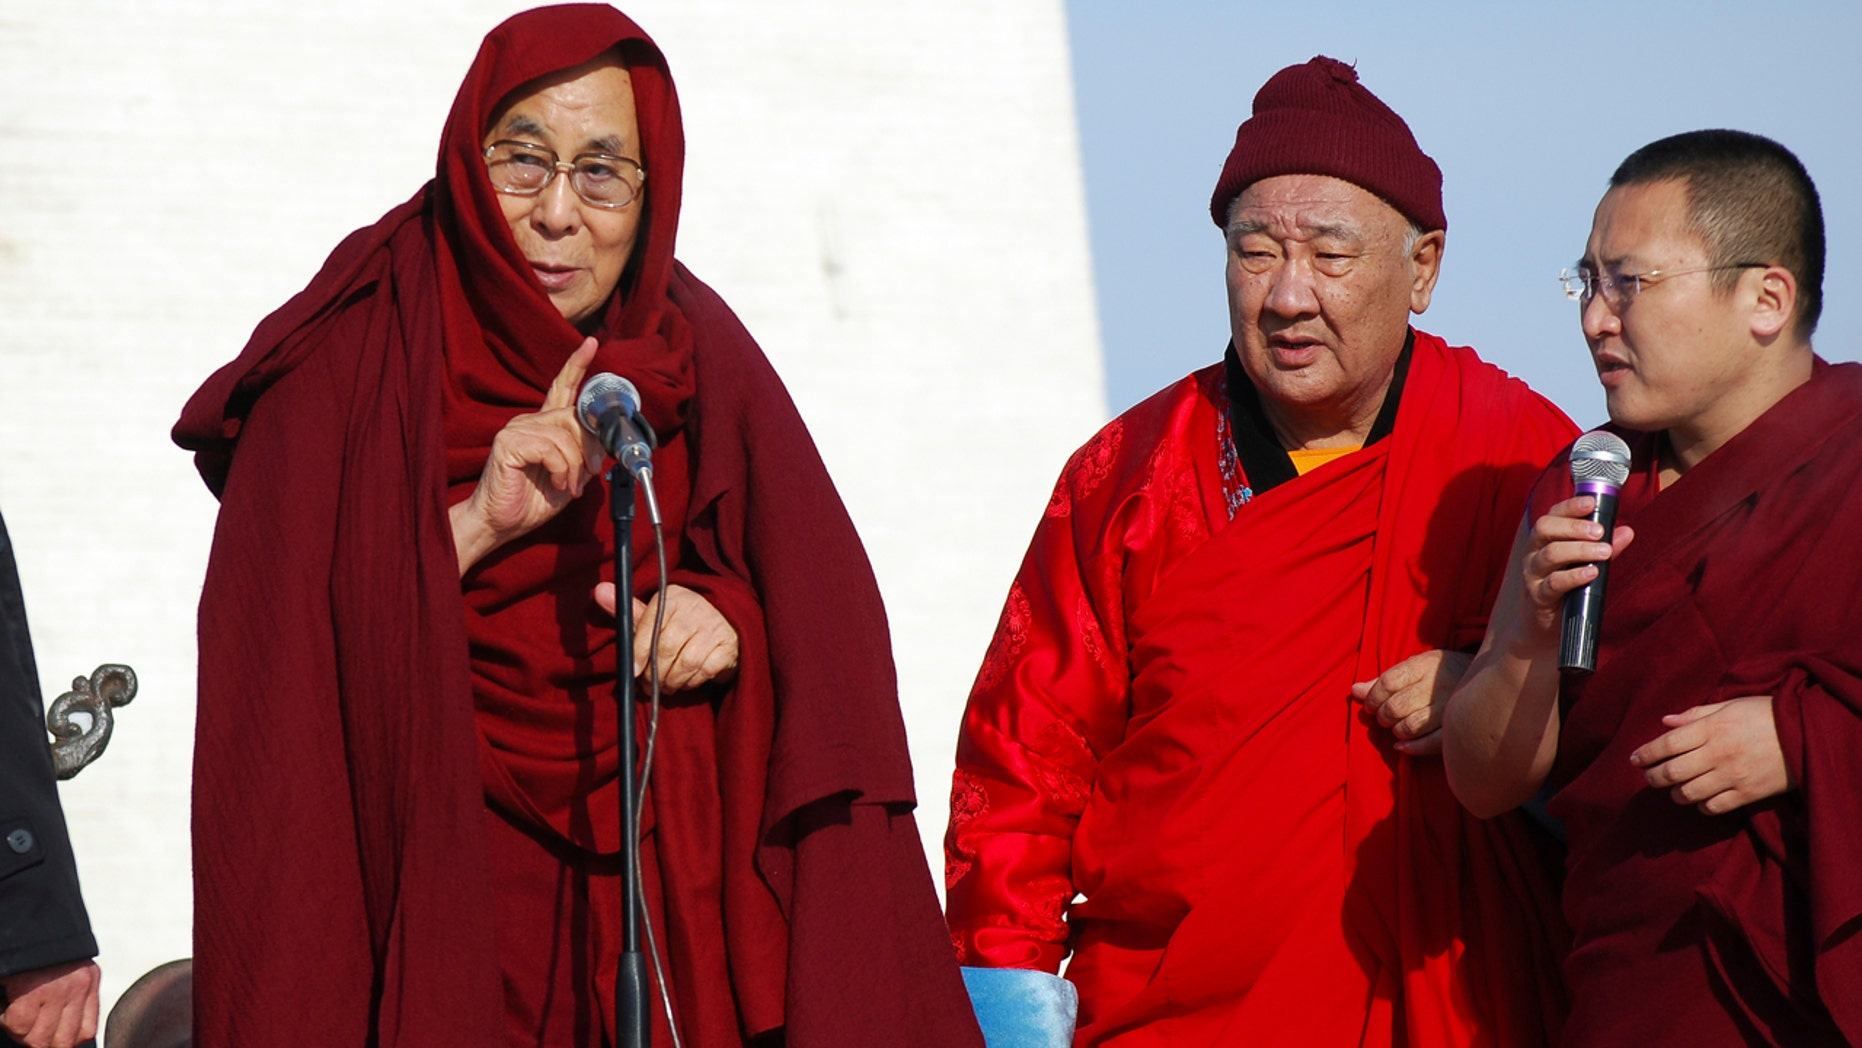 Nov. 19, 2016: The Dalai Lama, left, speaks at the Janraiseg Temple of Gandantegchinlen monastery in Ulaanbaatar, Mongolia.